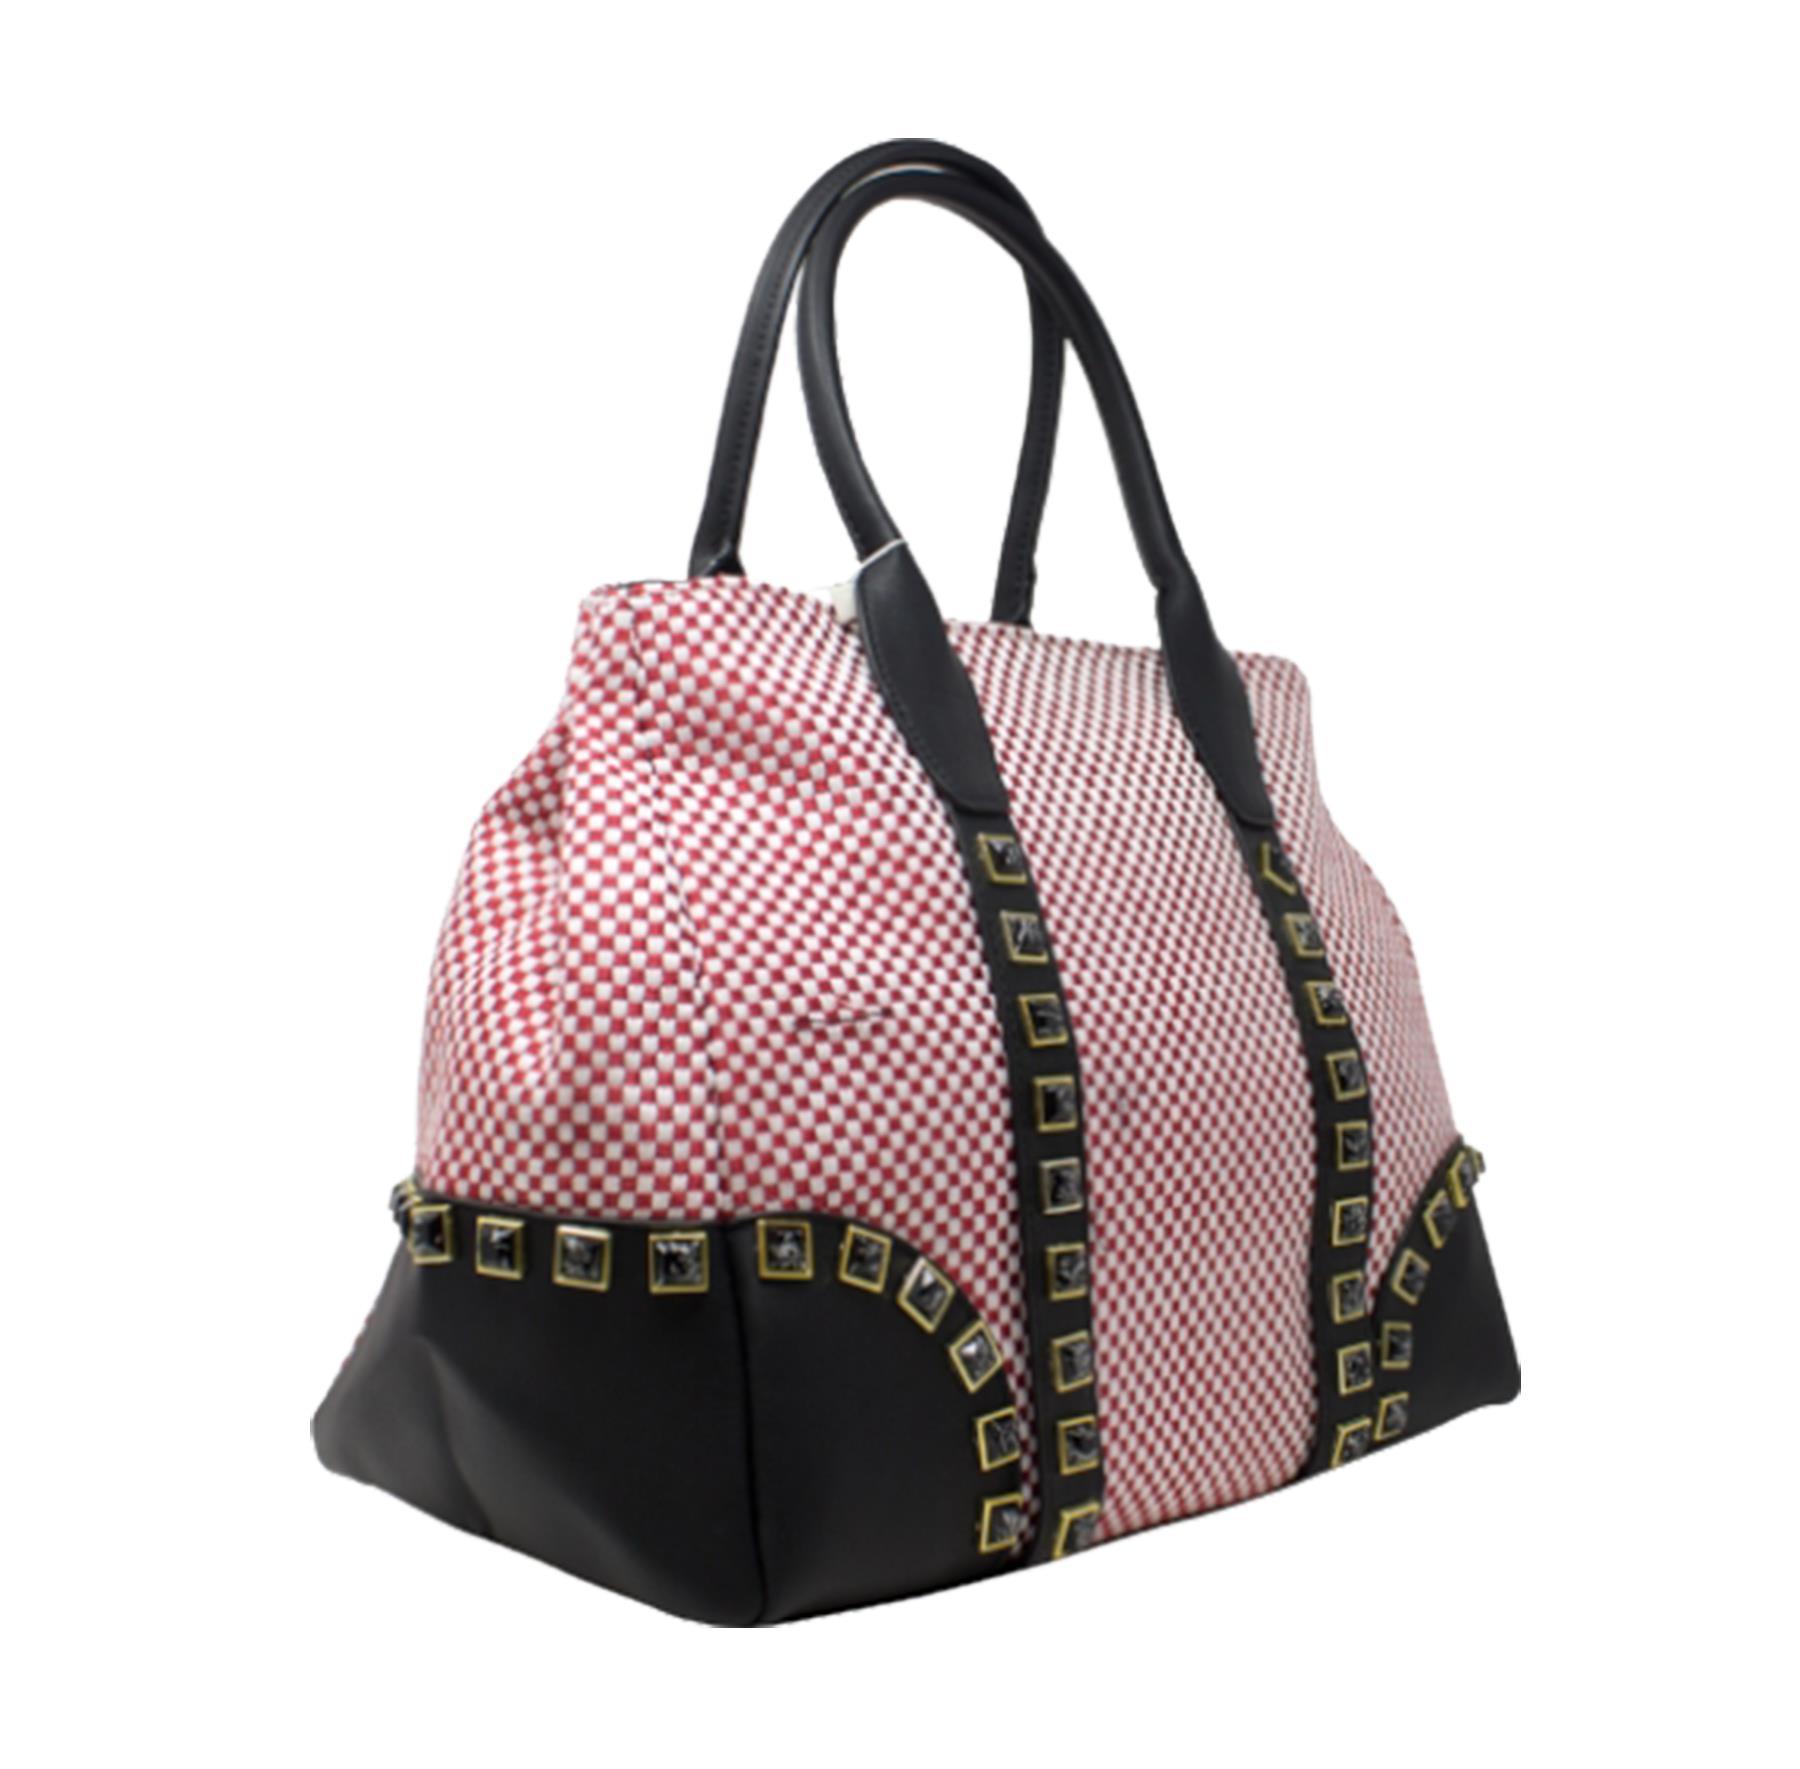 New-Women-s-Small-Check-Pattern-Studded-Design-Tote-Bag-Handbag thumbnail 17